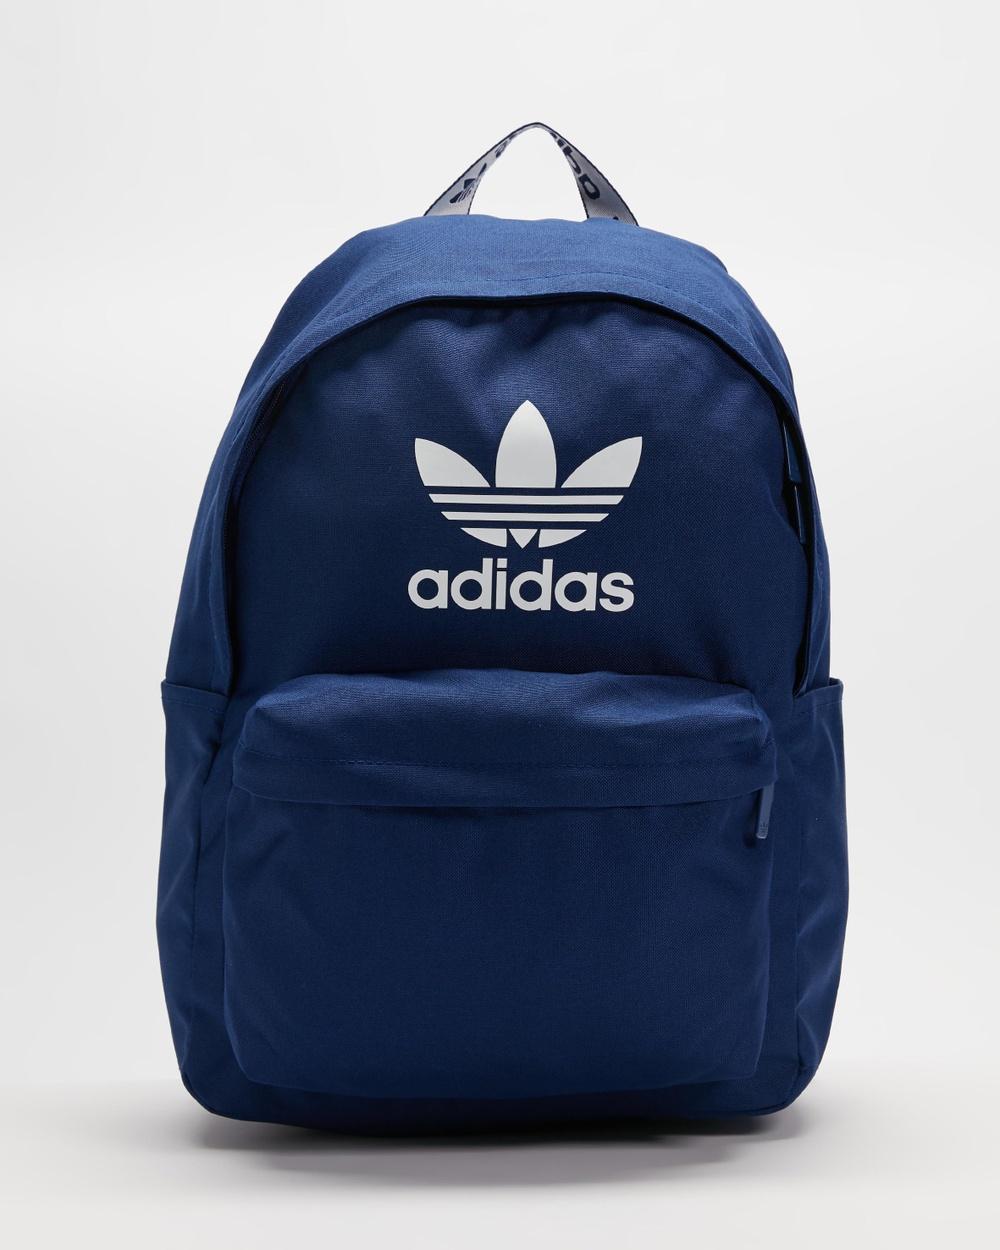 adidas Originals Adicolor Backpack Backpacks Victory Blue & White